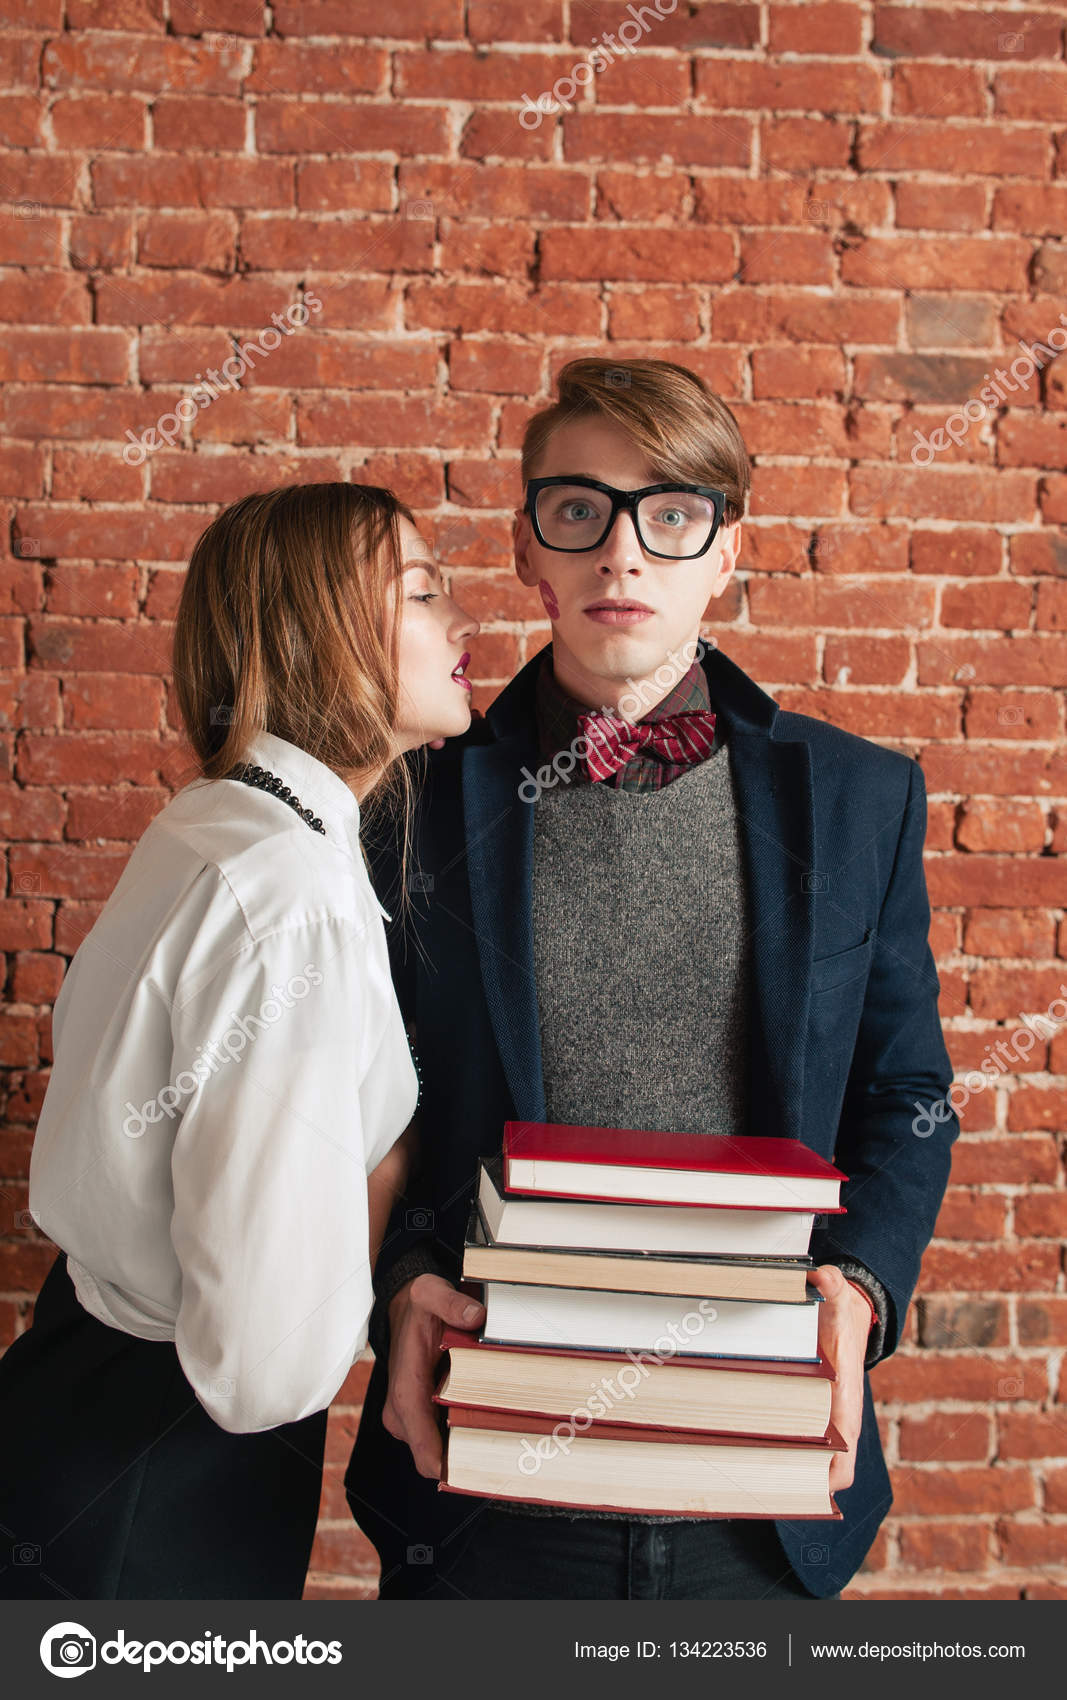 student lärare dating relationer Justin Bieber dating fans